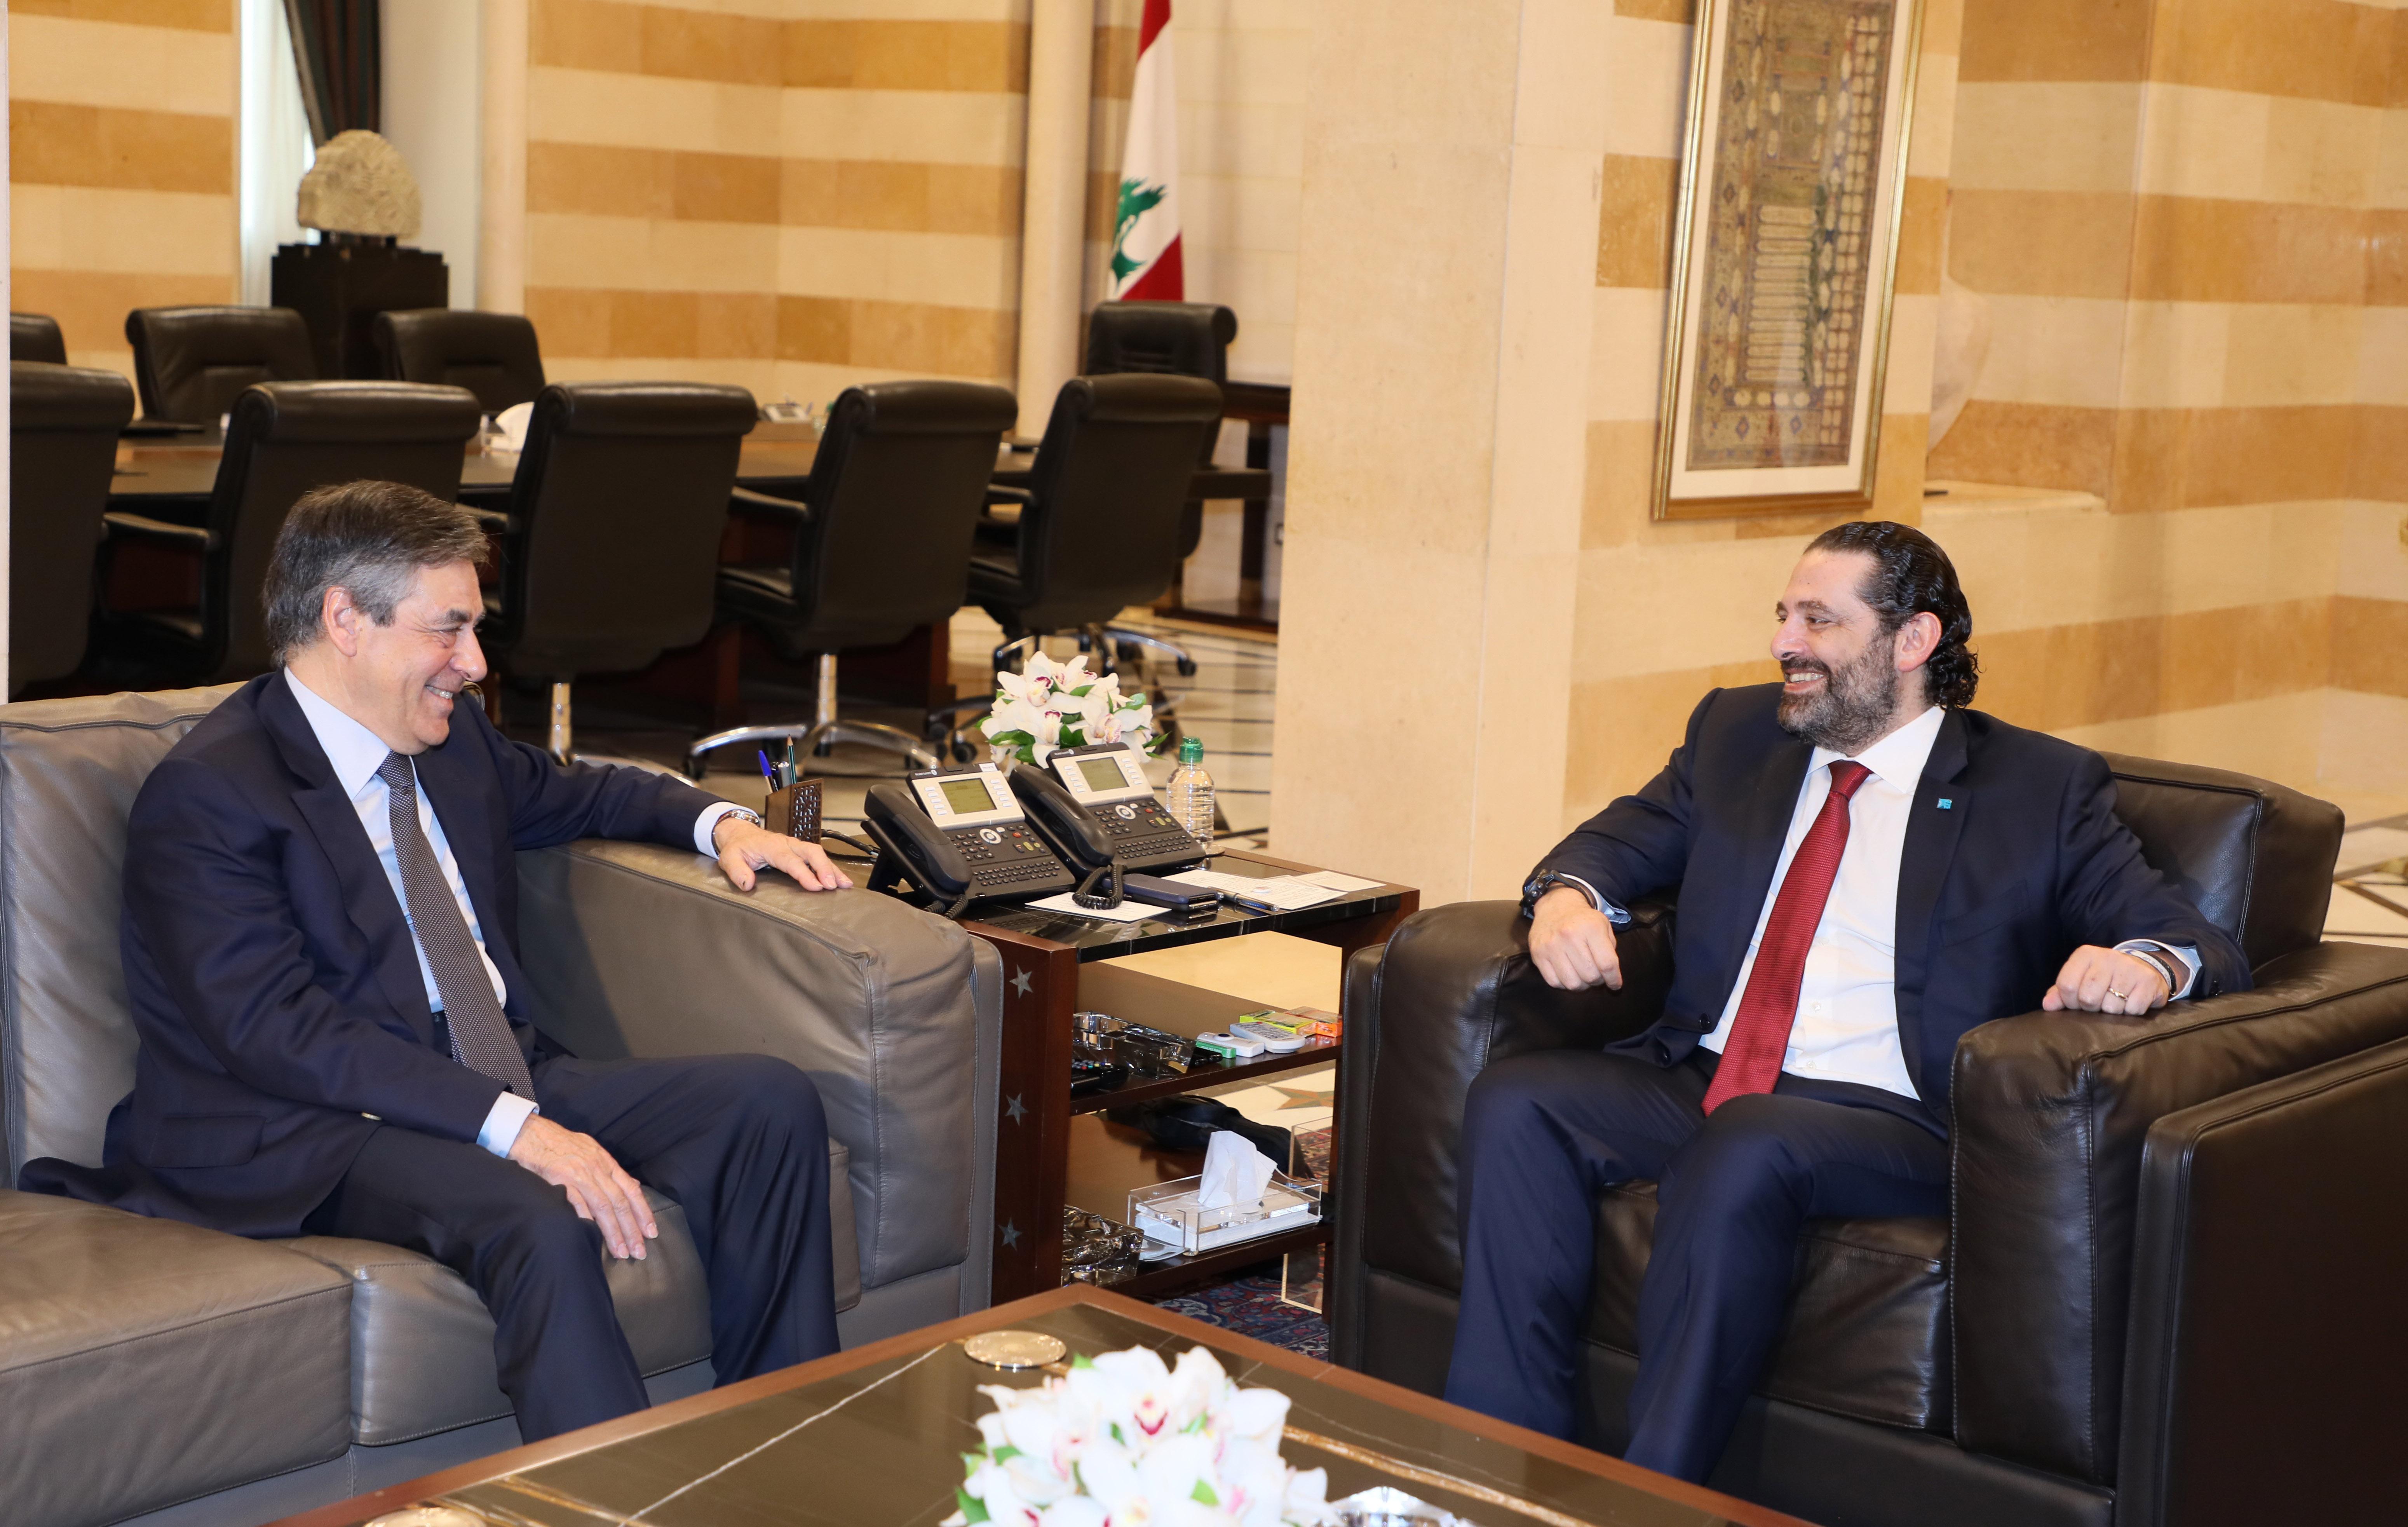 Pr Minisster Saad Hariri meets Former Pr Minister Francois Fillion